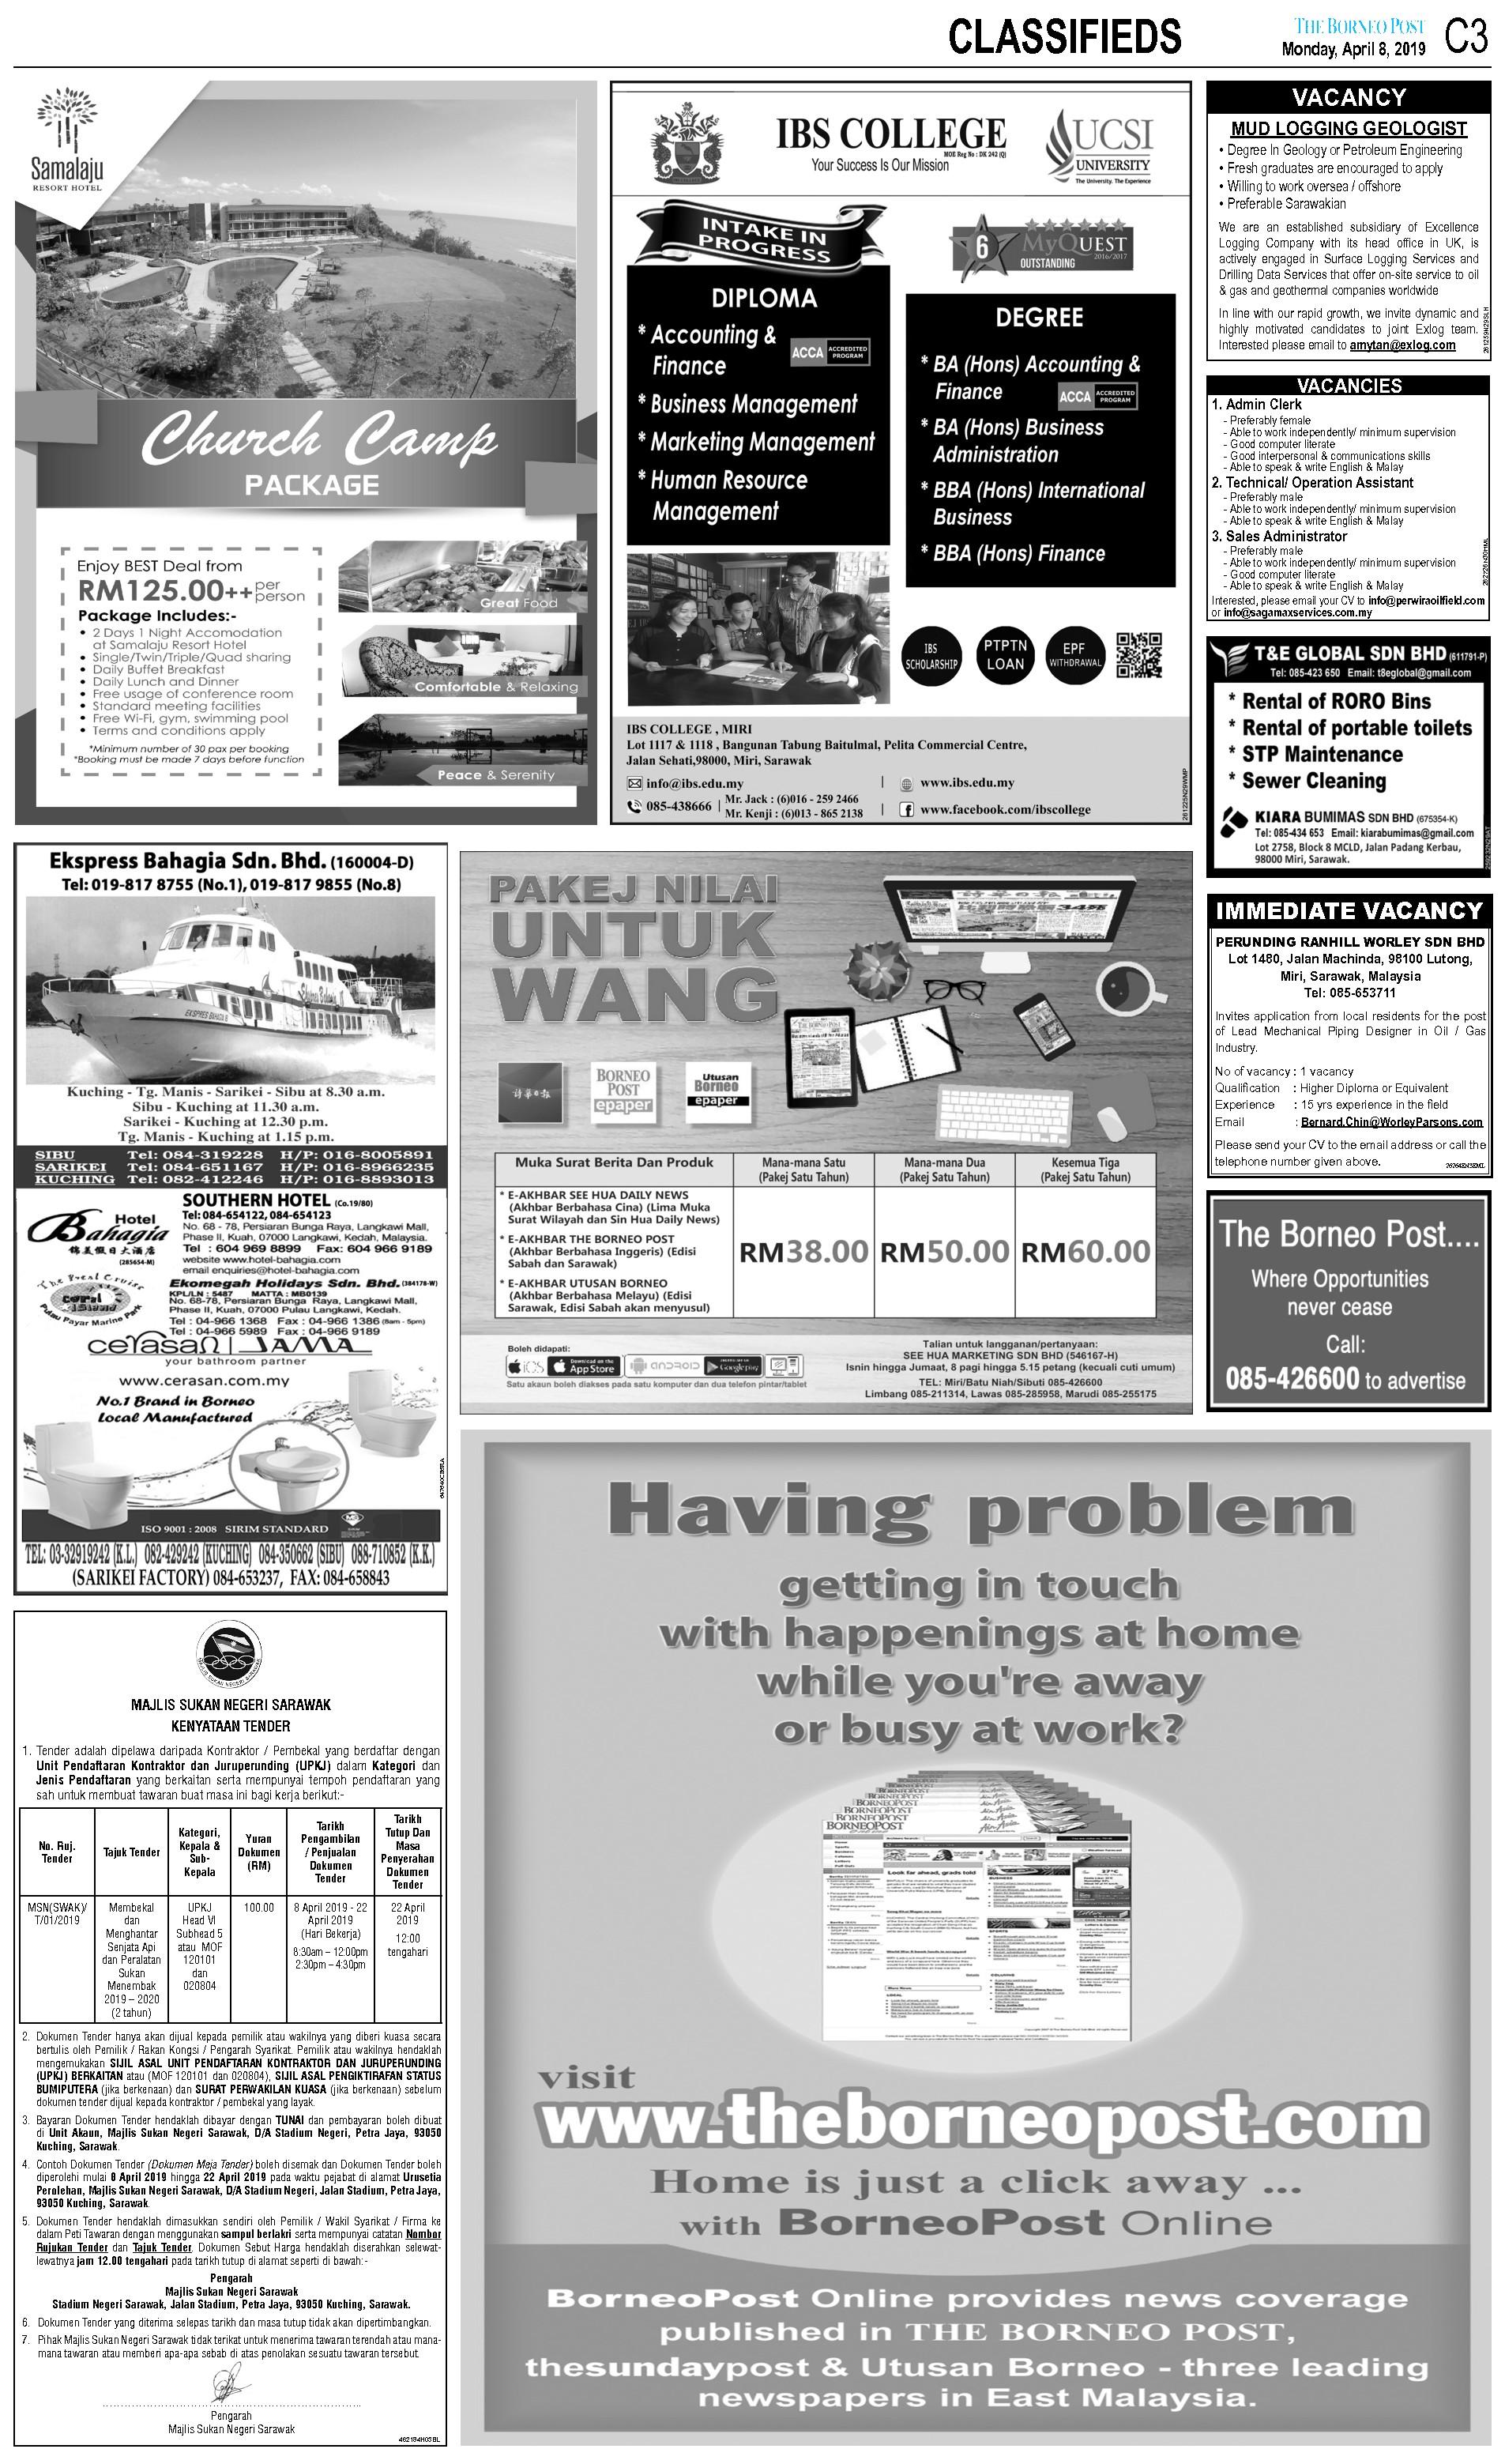 Monday - Apr 8   The Borneo Post Classifieds